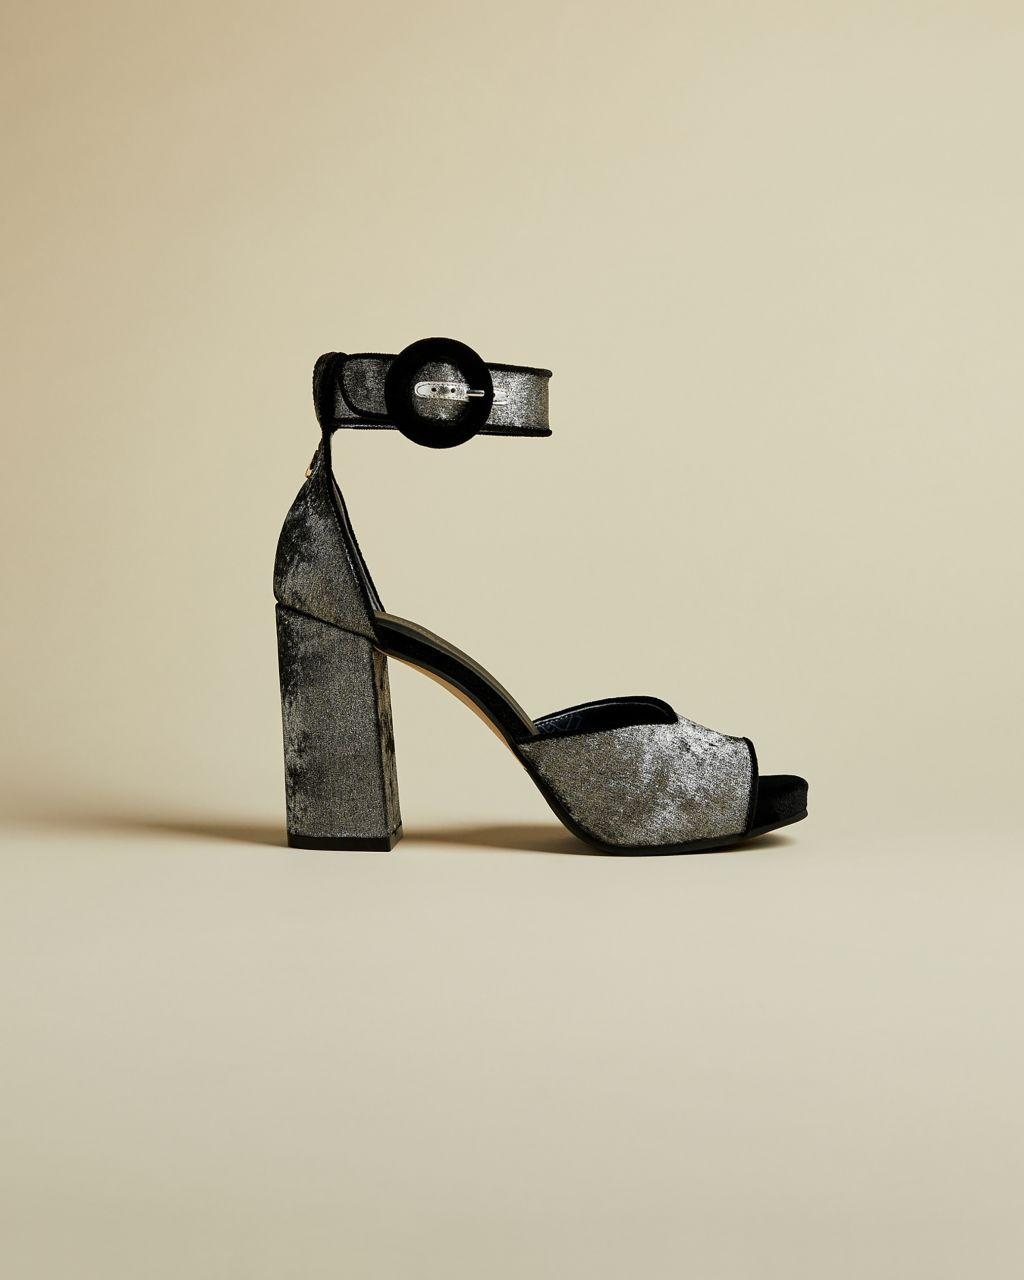 Zapatos De Tacón Abiertos Con Tacón Ancho Ted Baker de Caucho de color Gris